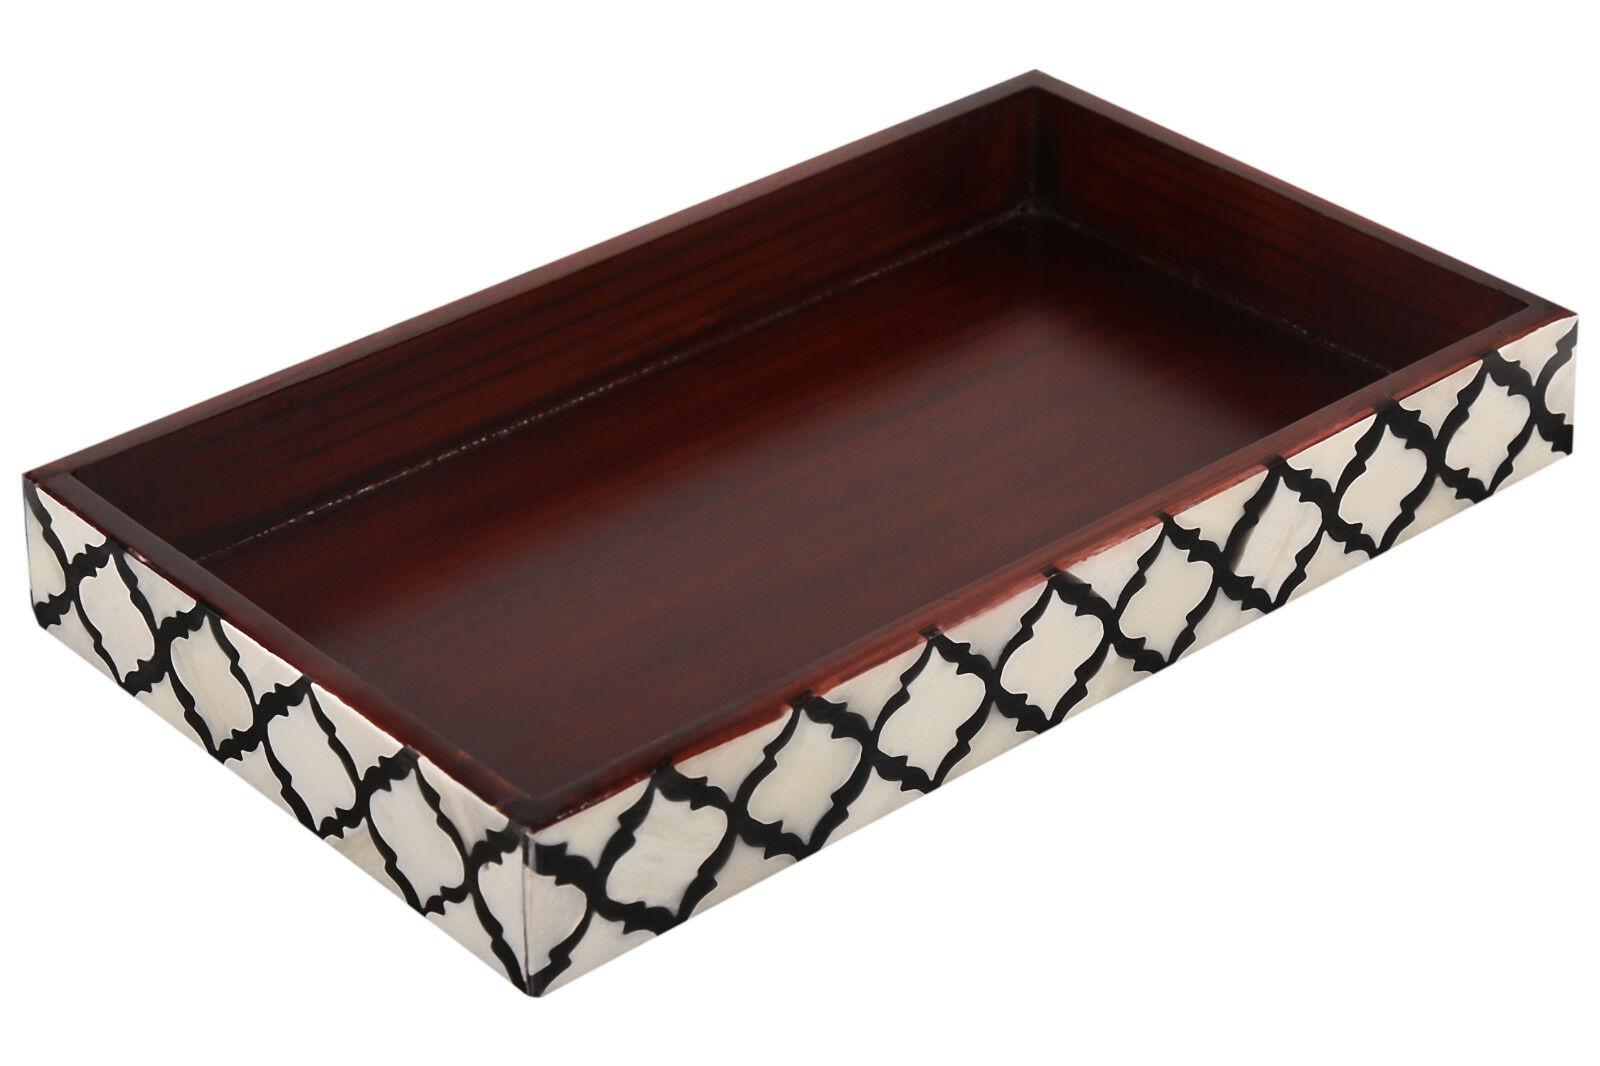 Handicrafts Home Towel Tray for Bathroom Vanity Organizer Ma